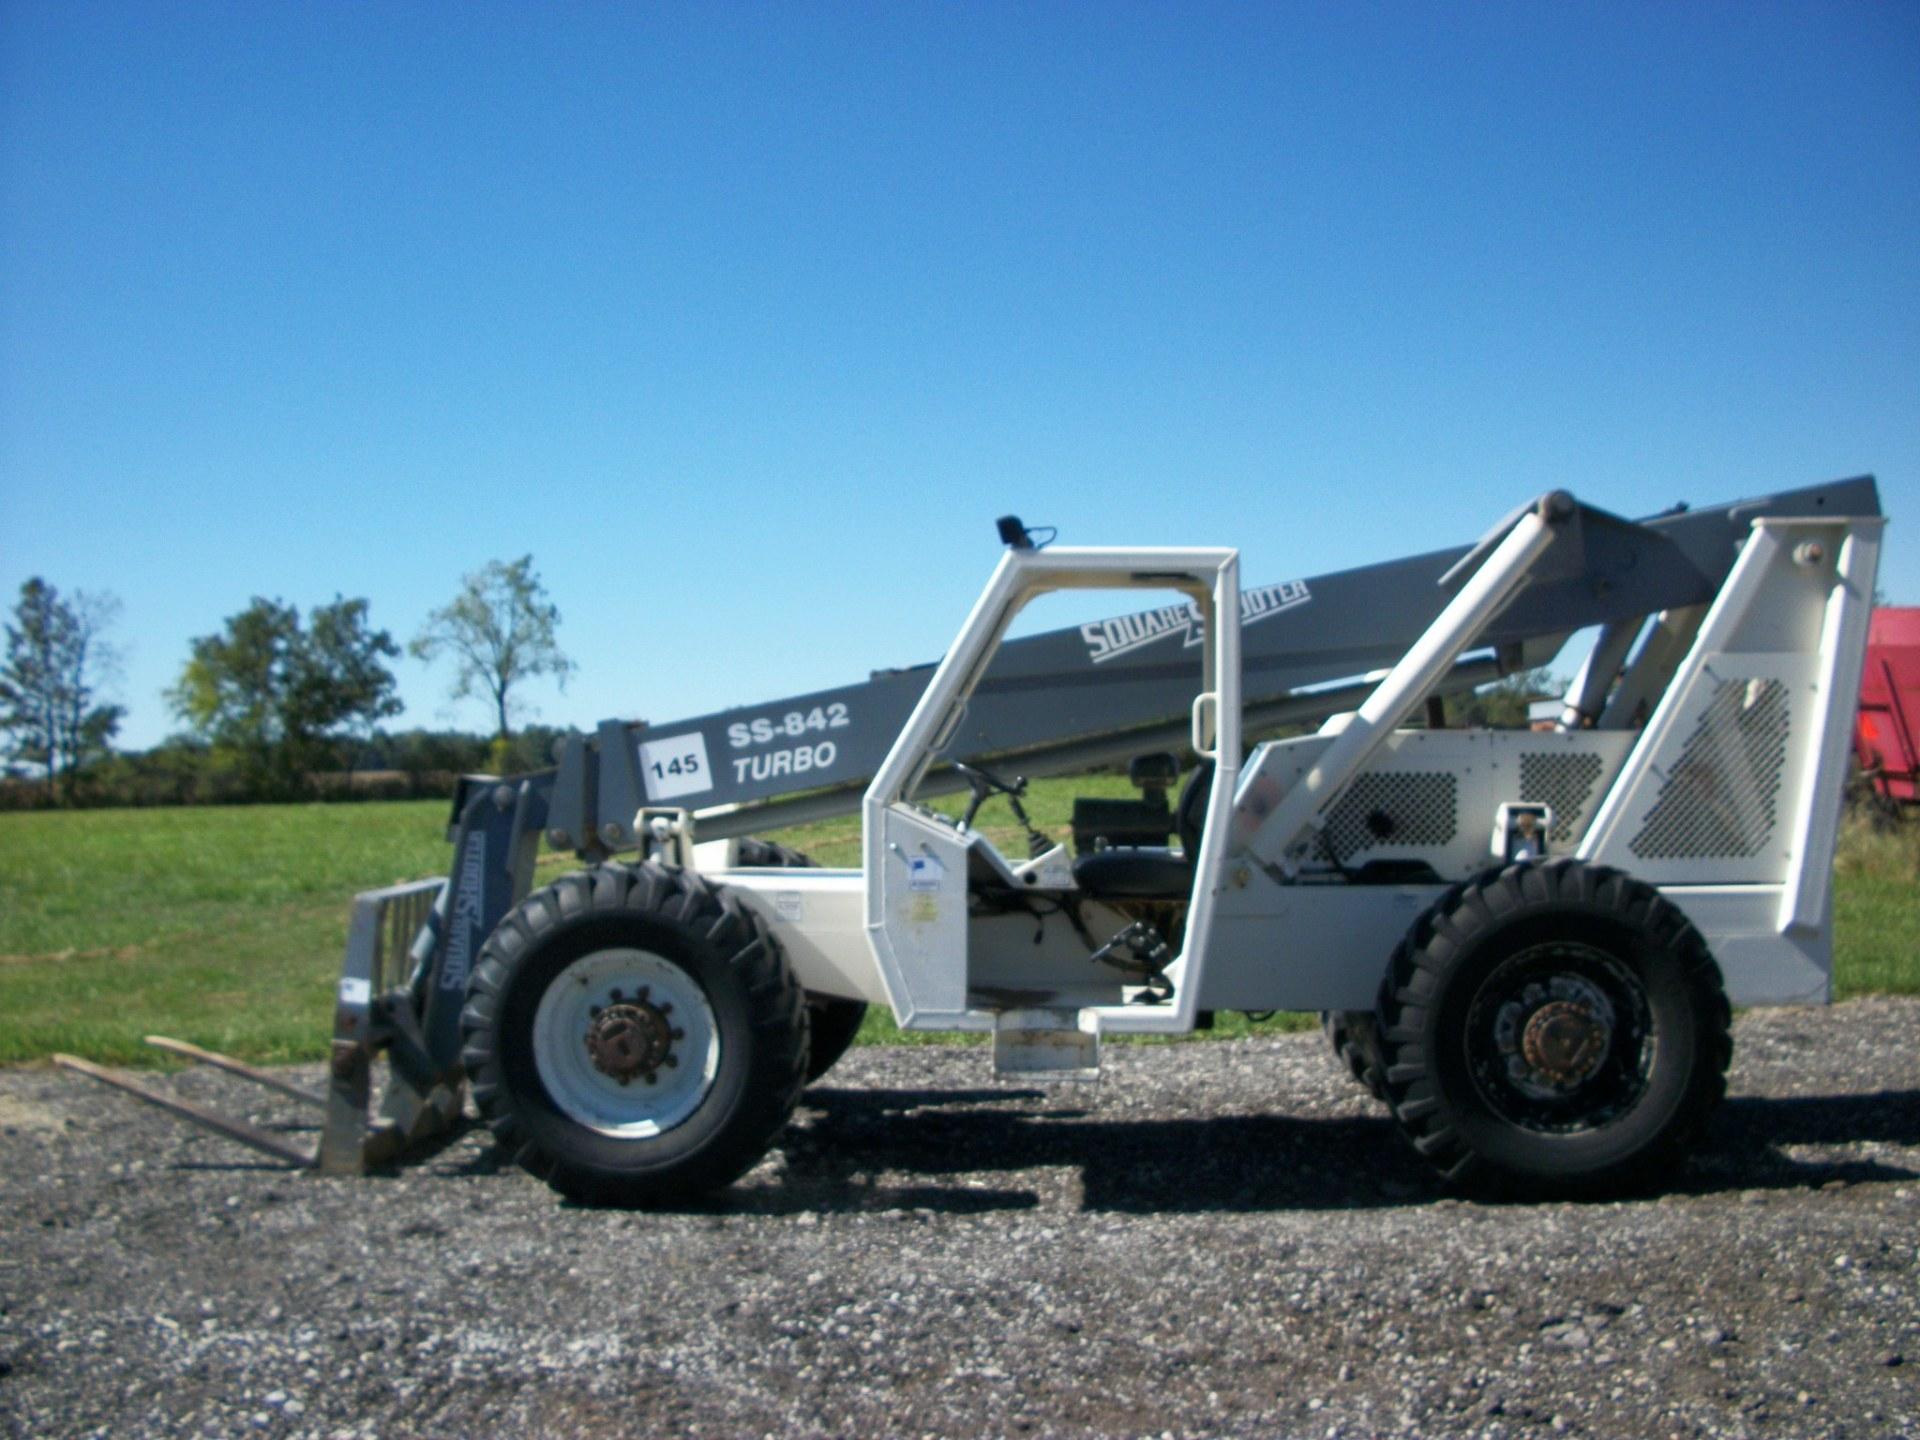 2000 Terex SS-842     $25,900